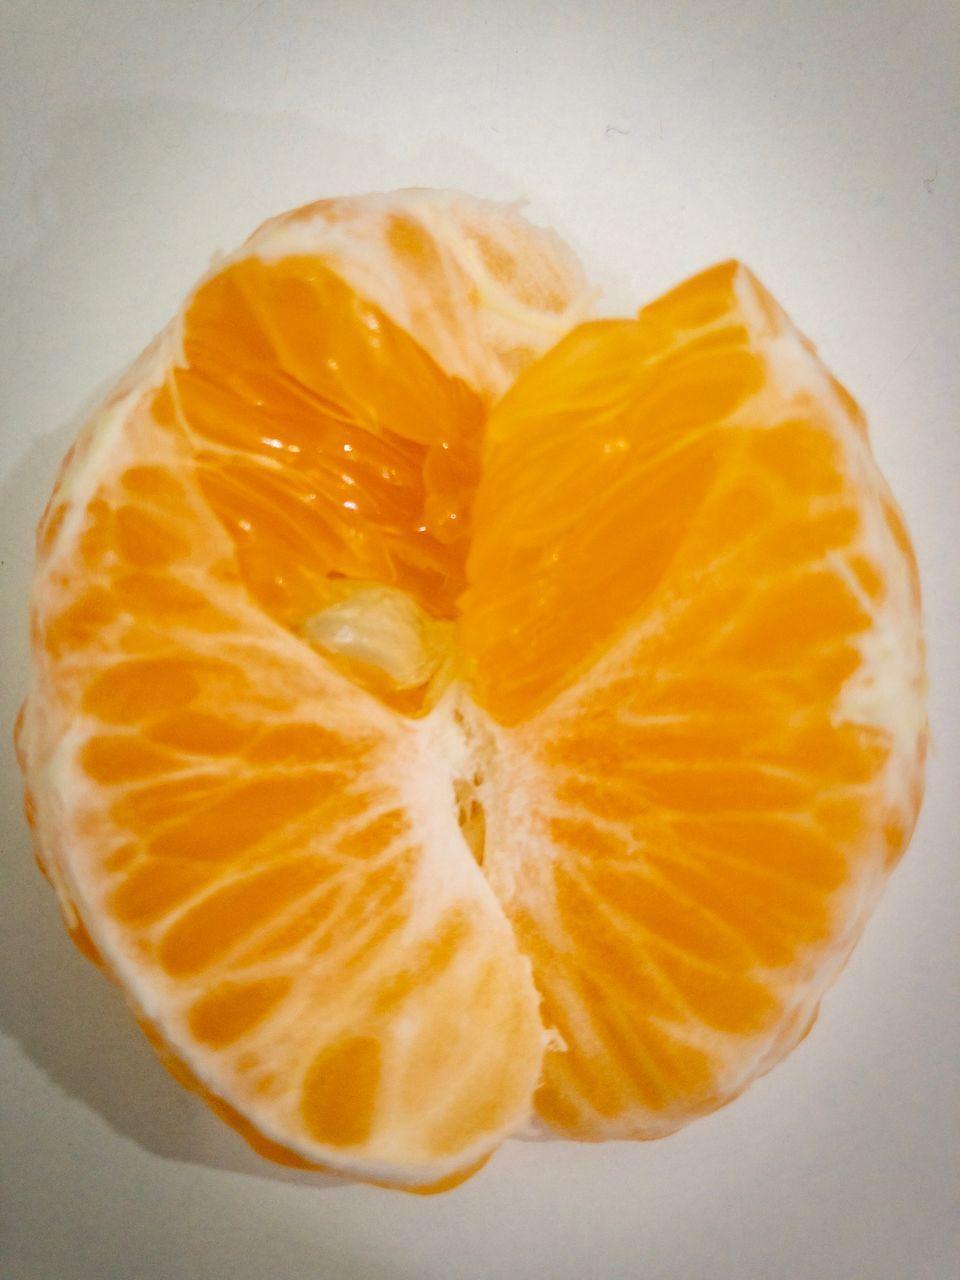 food, food and drink, citrus fruit, healthy eating, freshness, fruit, indoors, slice, still life, wellbeing, studio shot, close-up, no people, white background, orange color, orange, orange - fruit, yellow, directly above, cross section, ripe